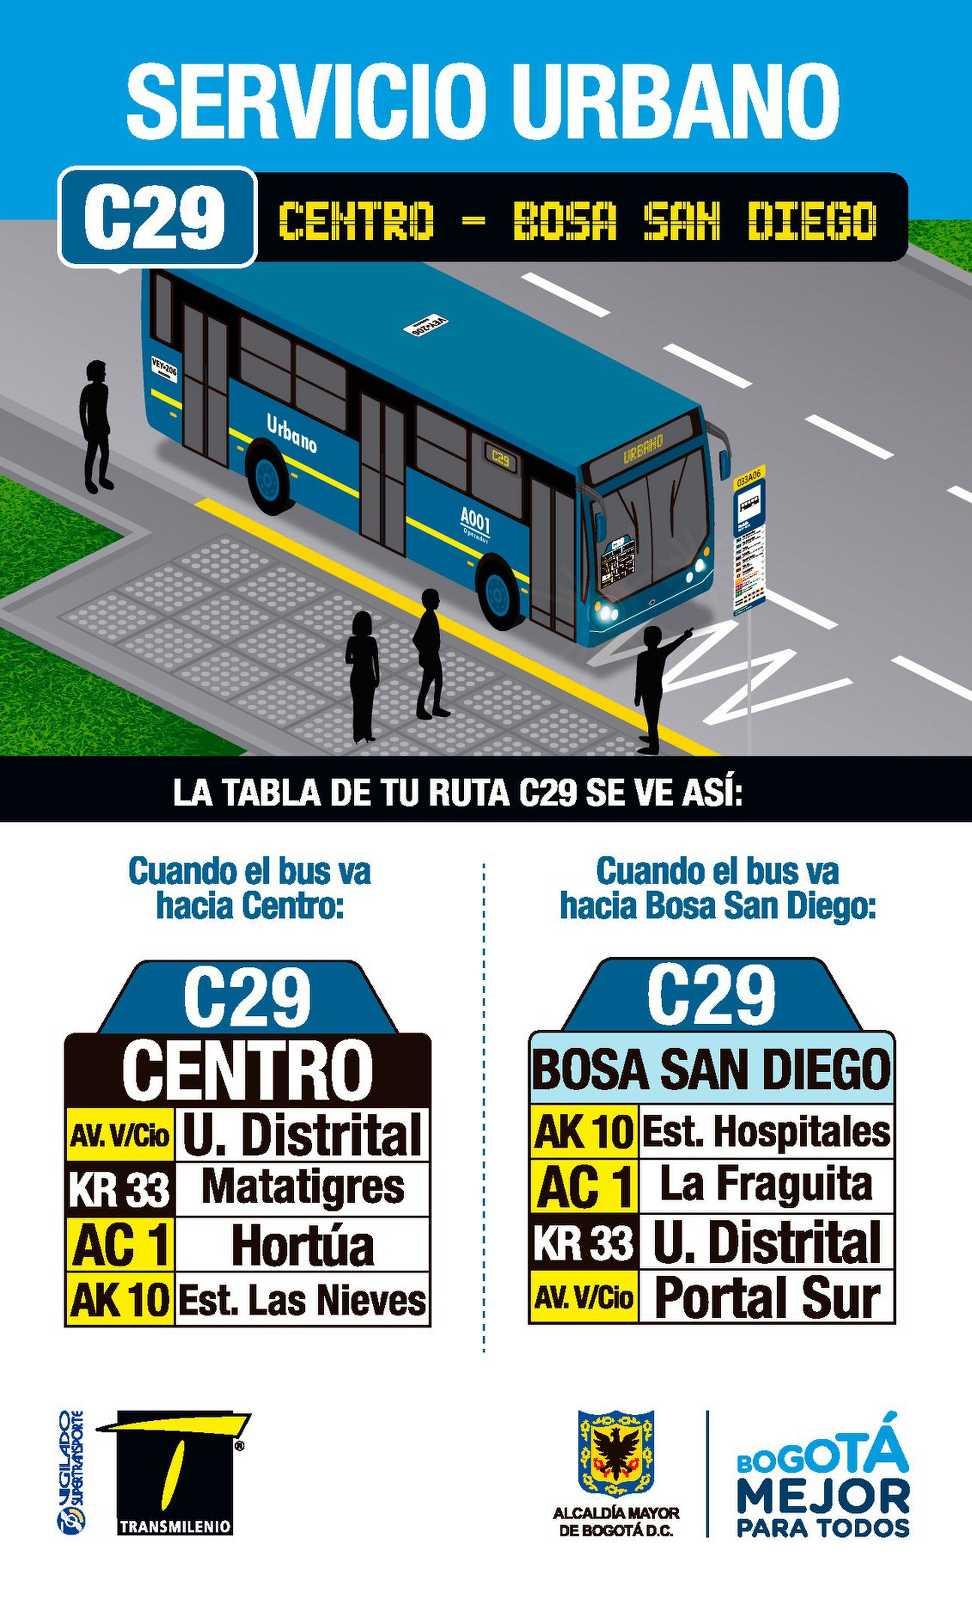 C29 > Centro - Bosa San Diego (volante A)